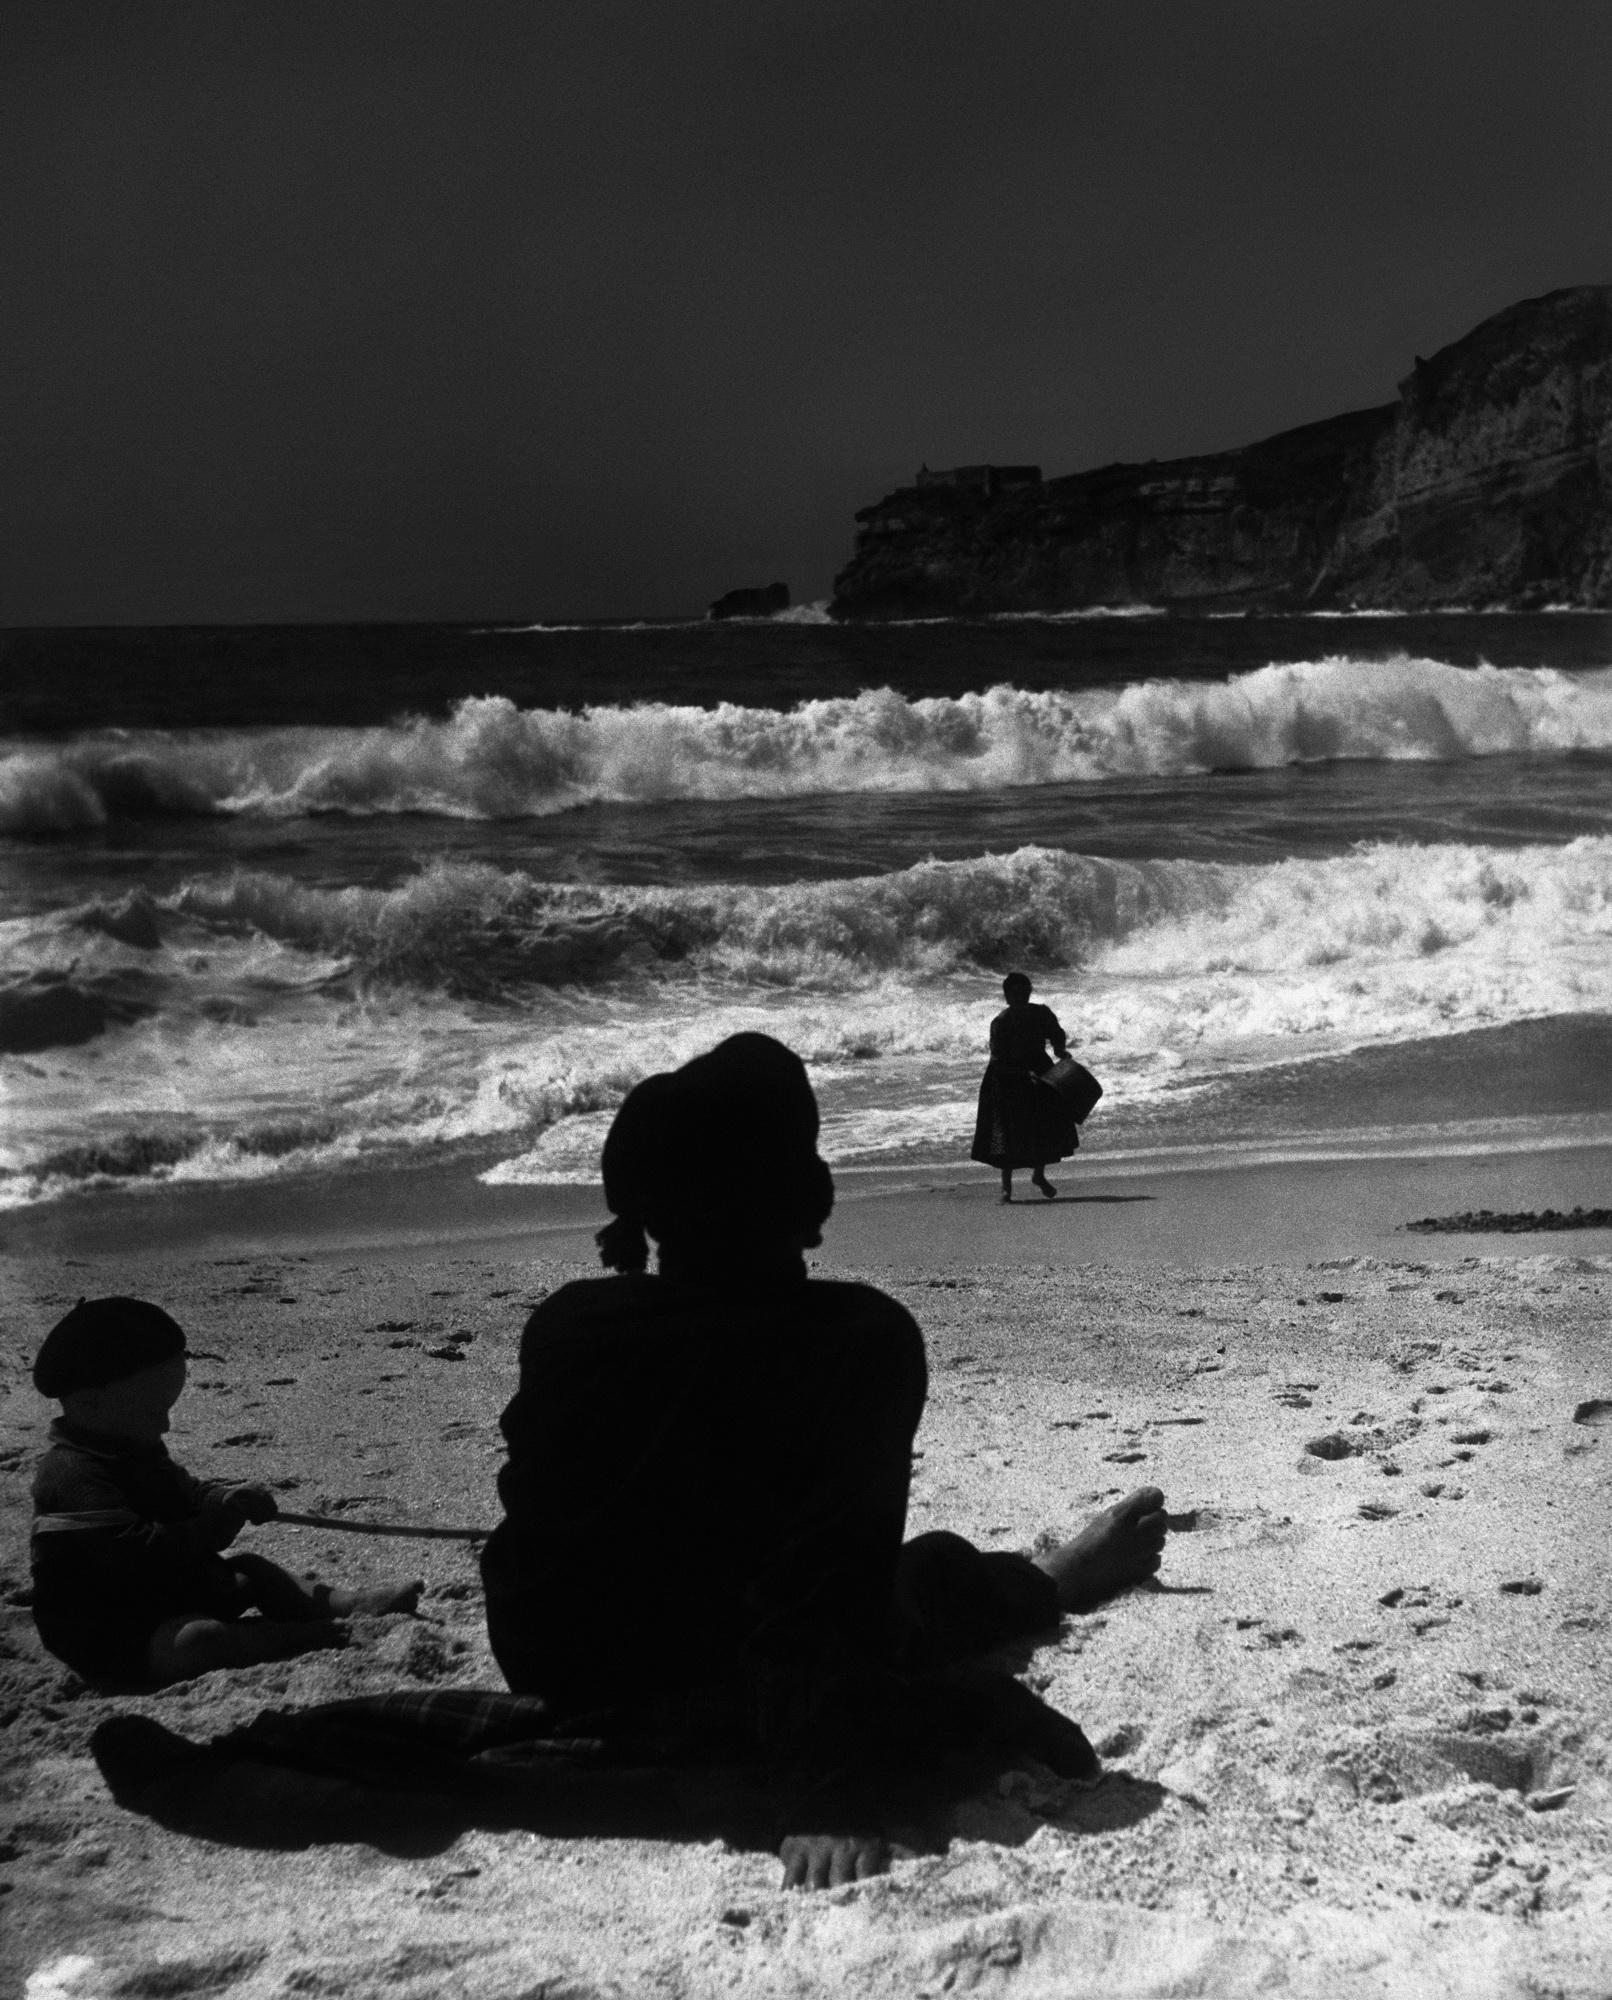 BEACH / KUMSAL